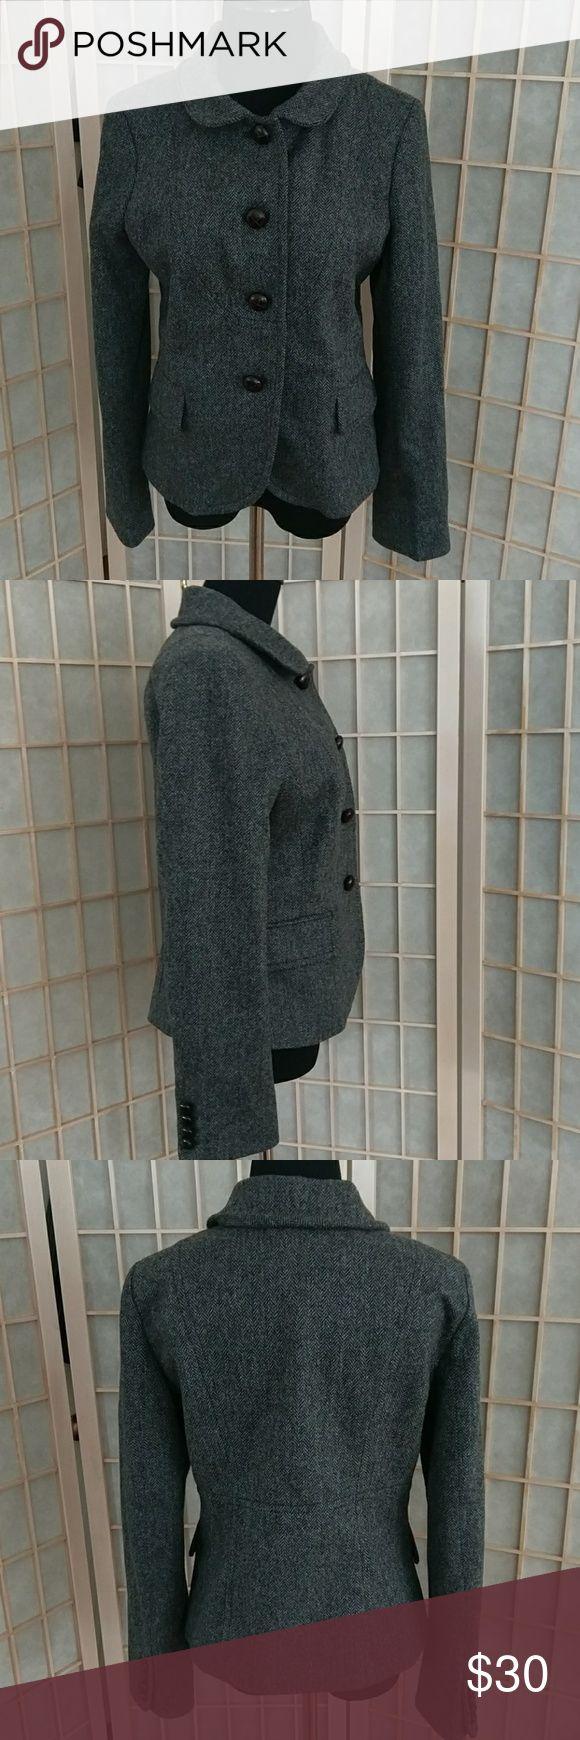 J Crew herringbone pattern lined wool jacket J Crew wool jacket in herringbone pattern. Full lined. Pockets. Size 8 women's. Medium. Leather buttons. J Crew Jackets & Coats